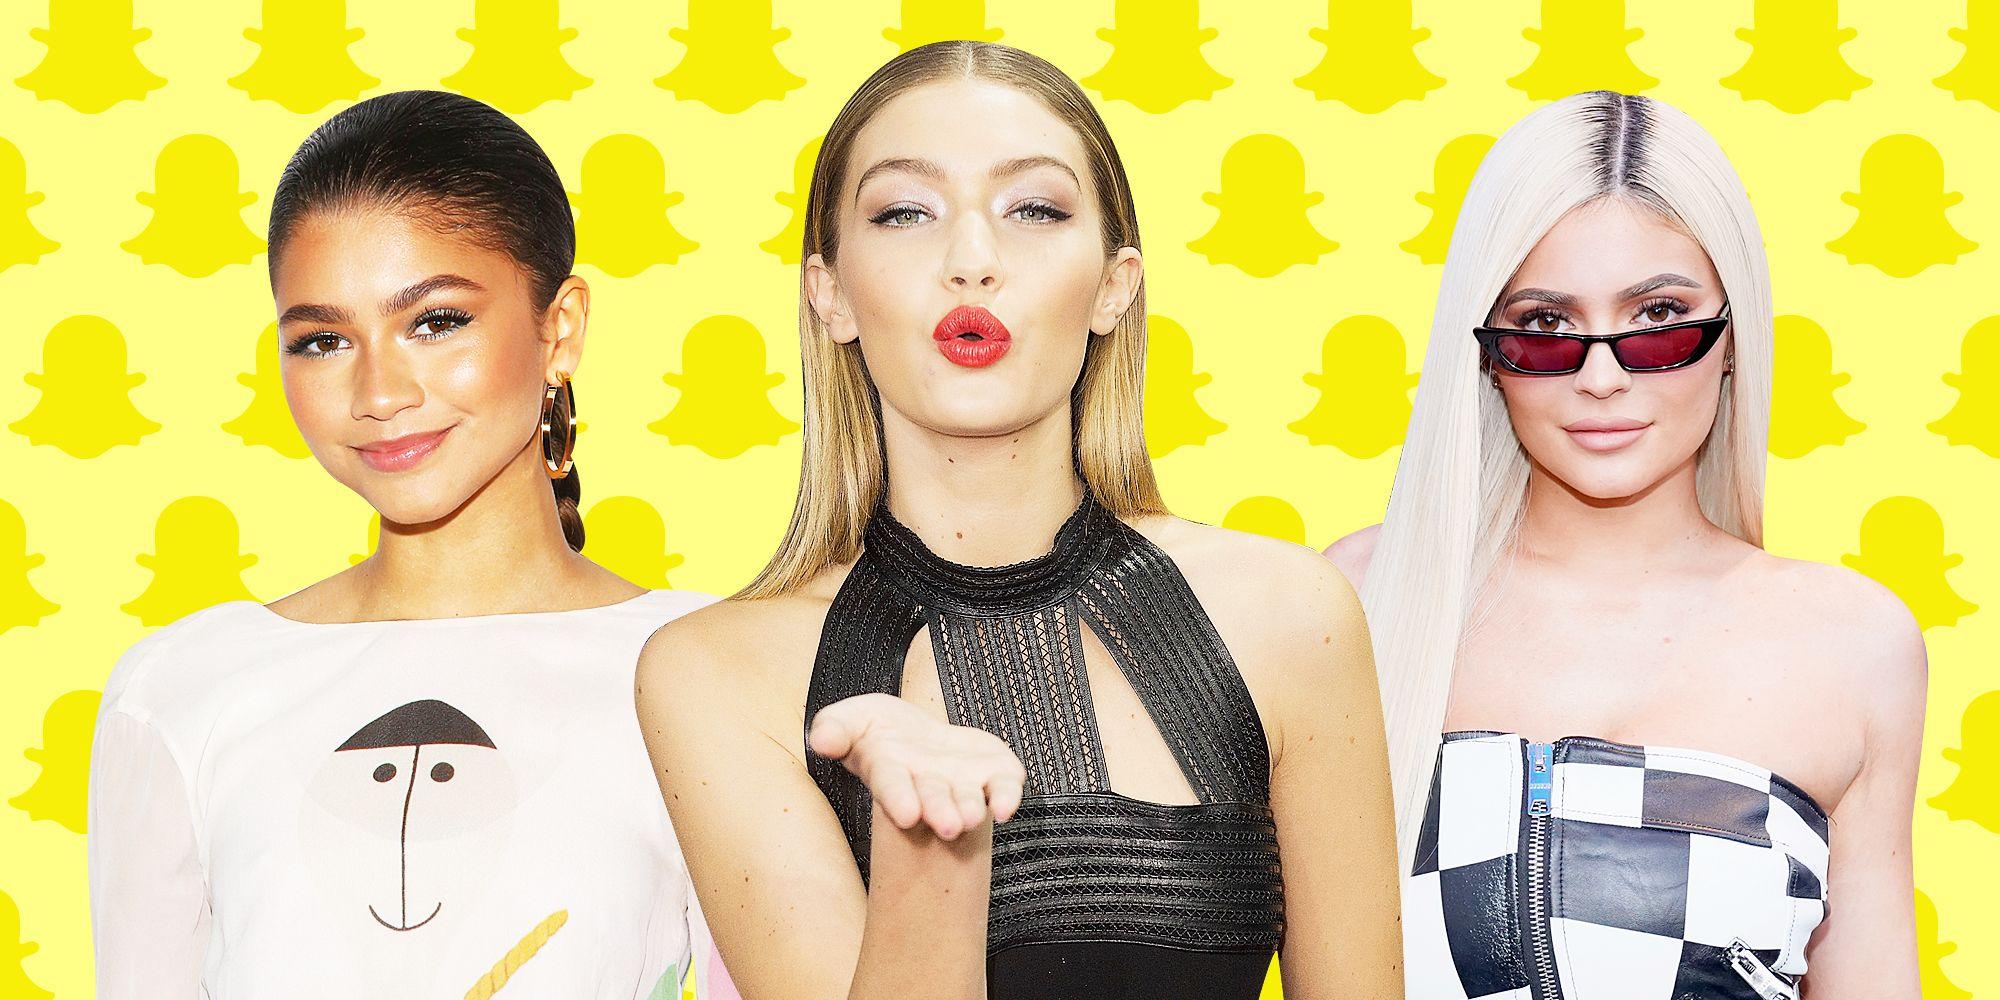 Hot girls snapchat accounts